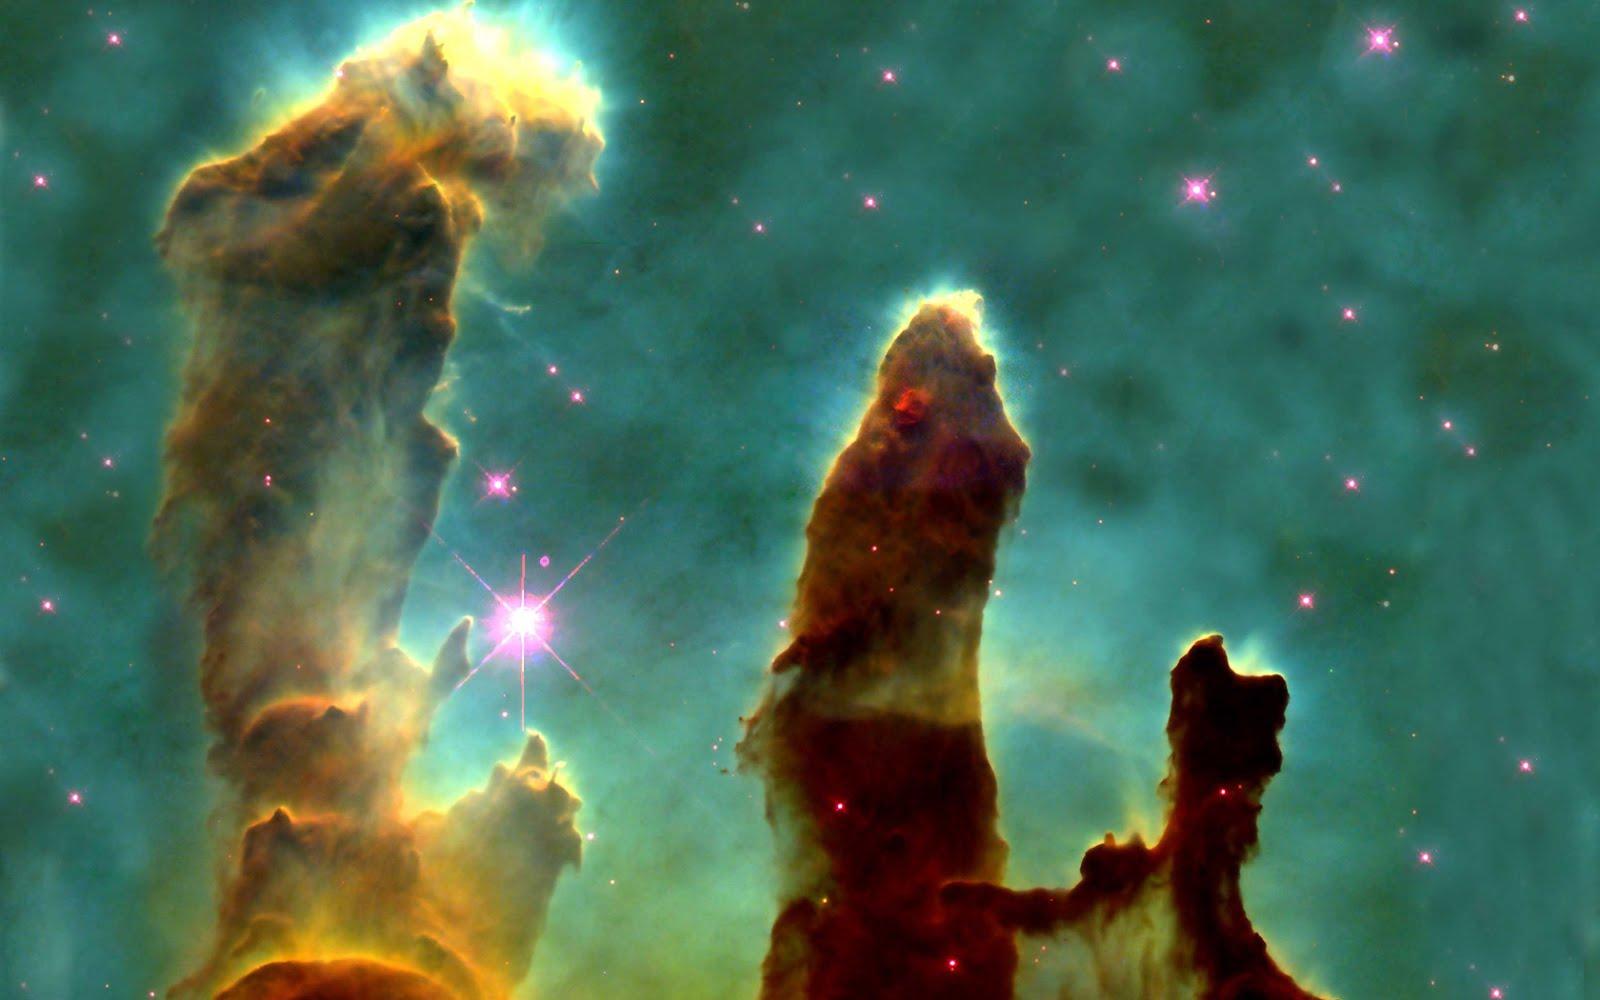 Hd Wallpapers For Desktop Beautiful Eagle Nebula Pillars